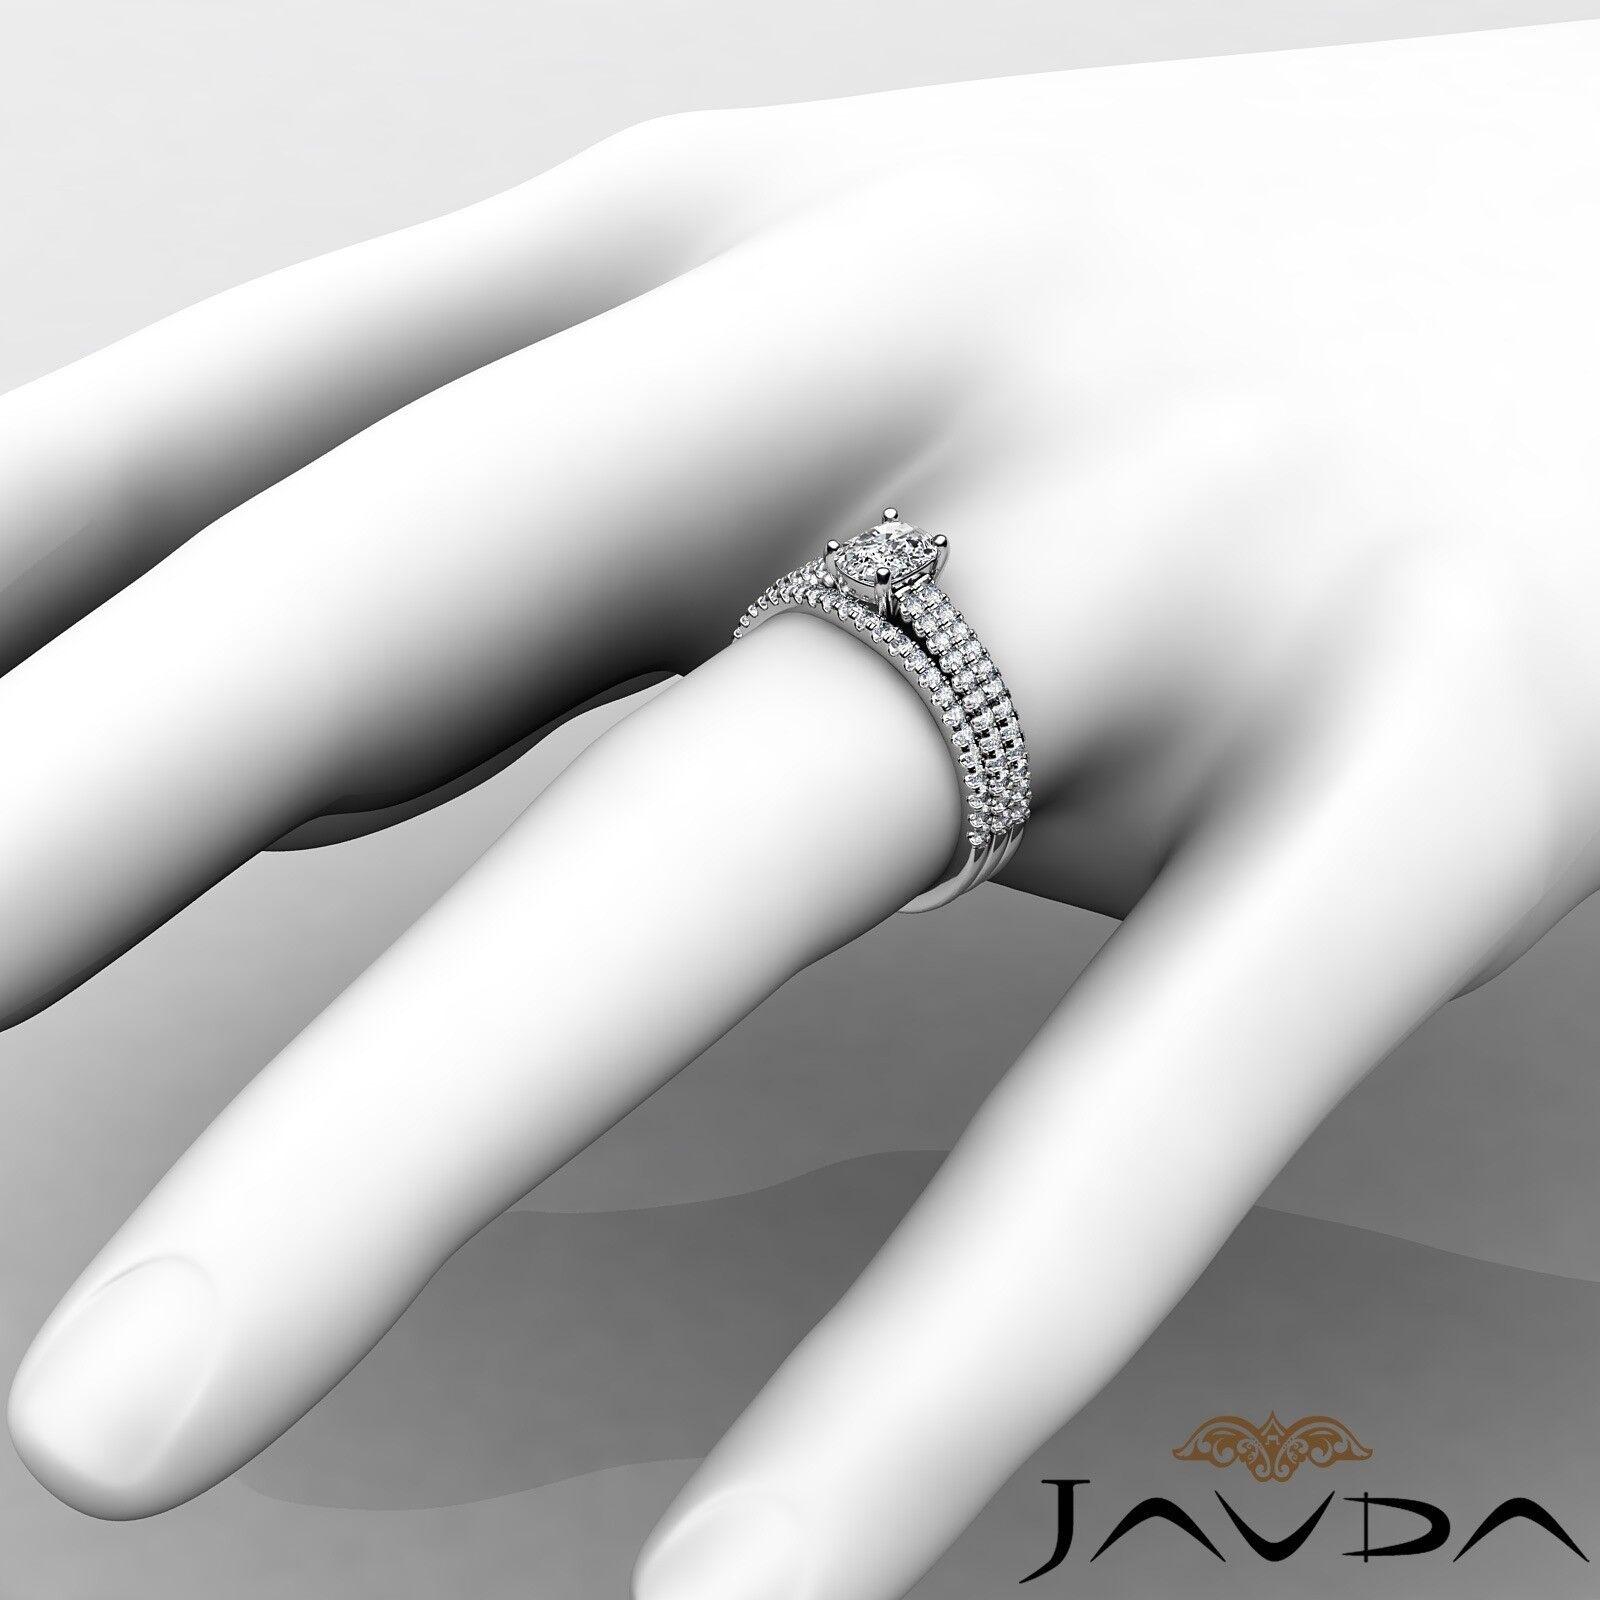 1.8ctw Bridal Scalloped Pave Cushion Diamond Engagement Ring GIA F-VVS2 W Gold 4